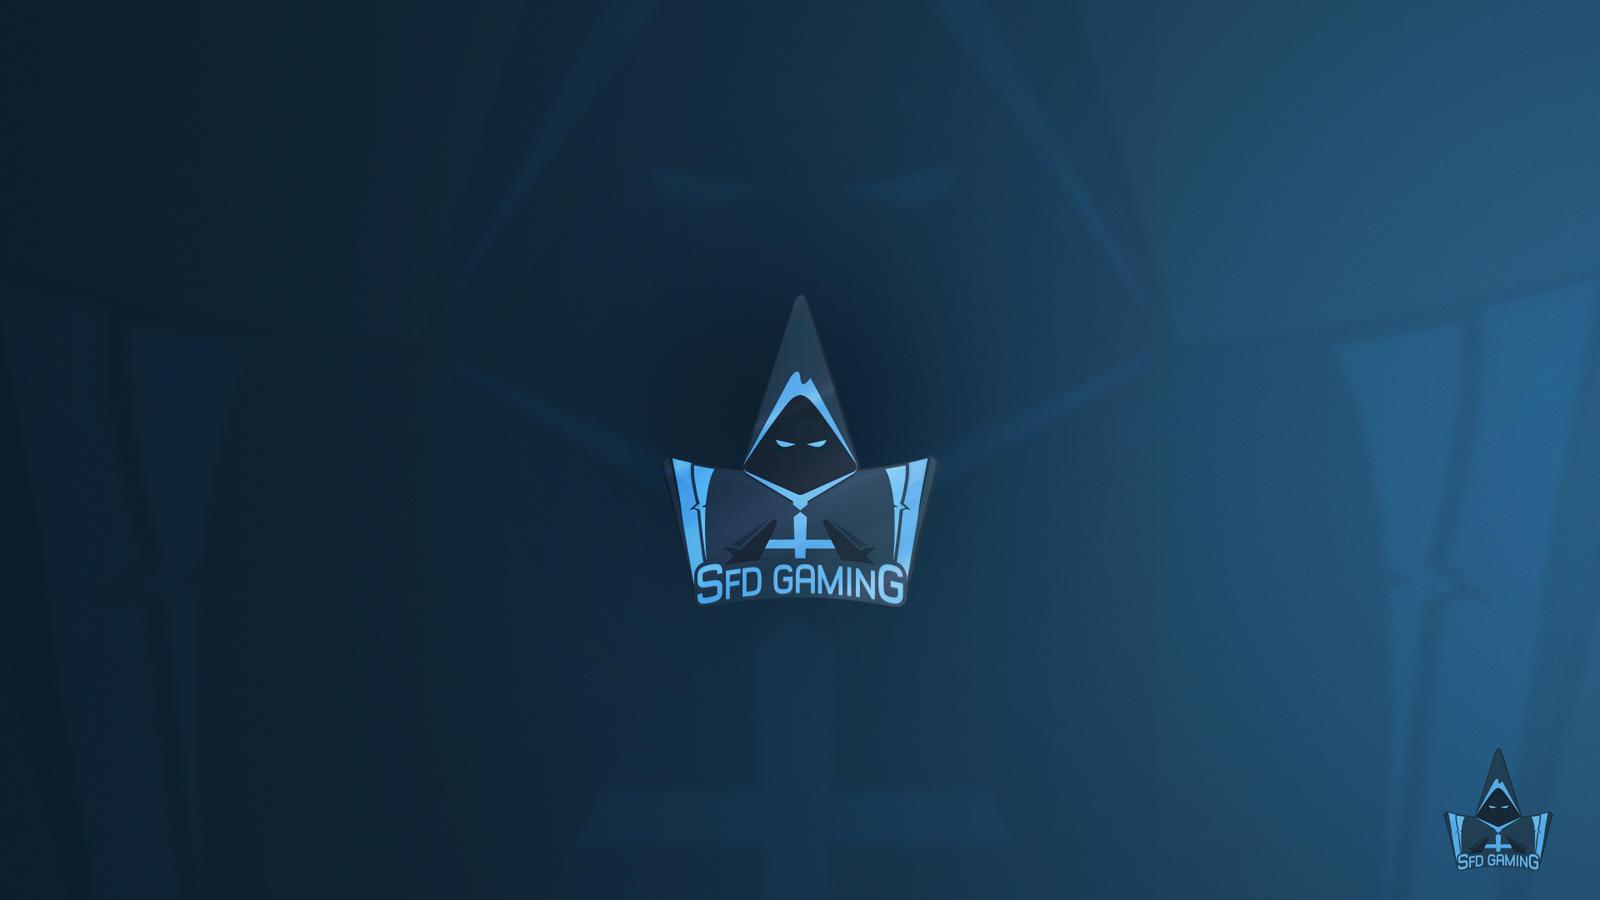 SFD Gaming by schuetzthomas